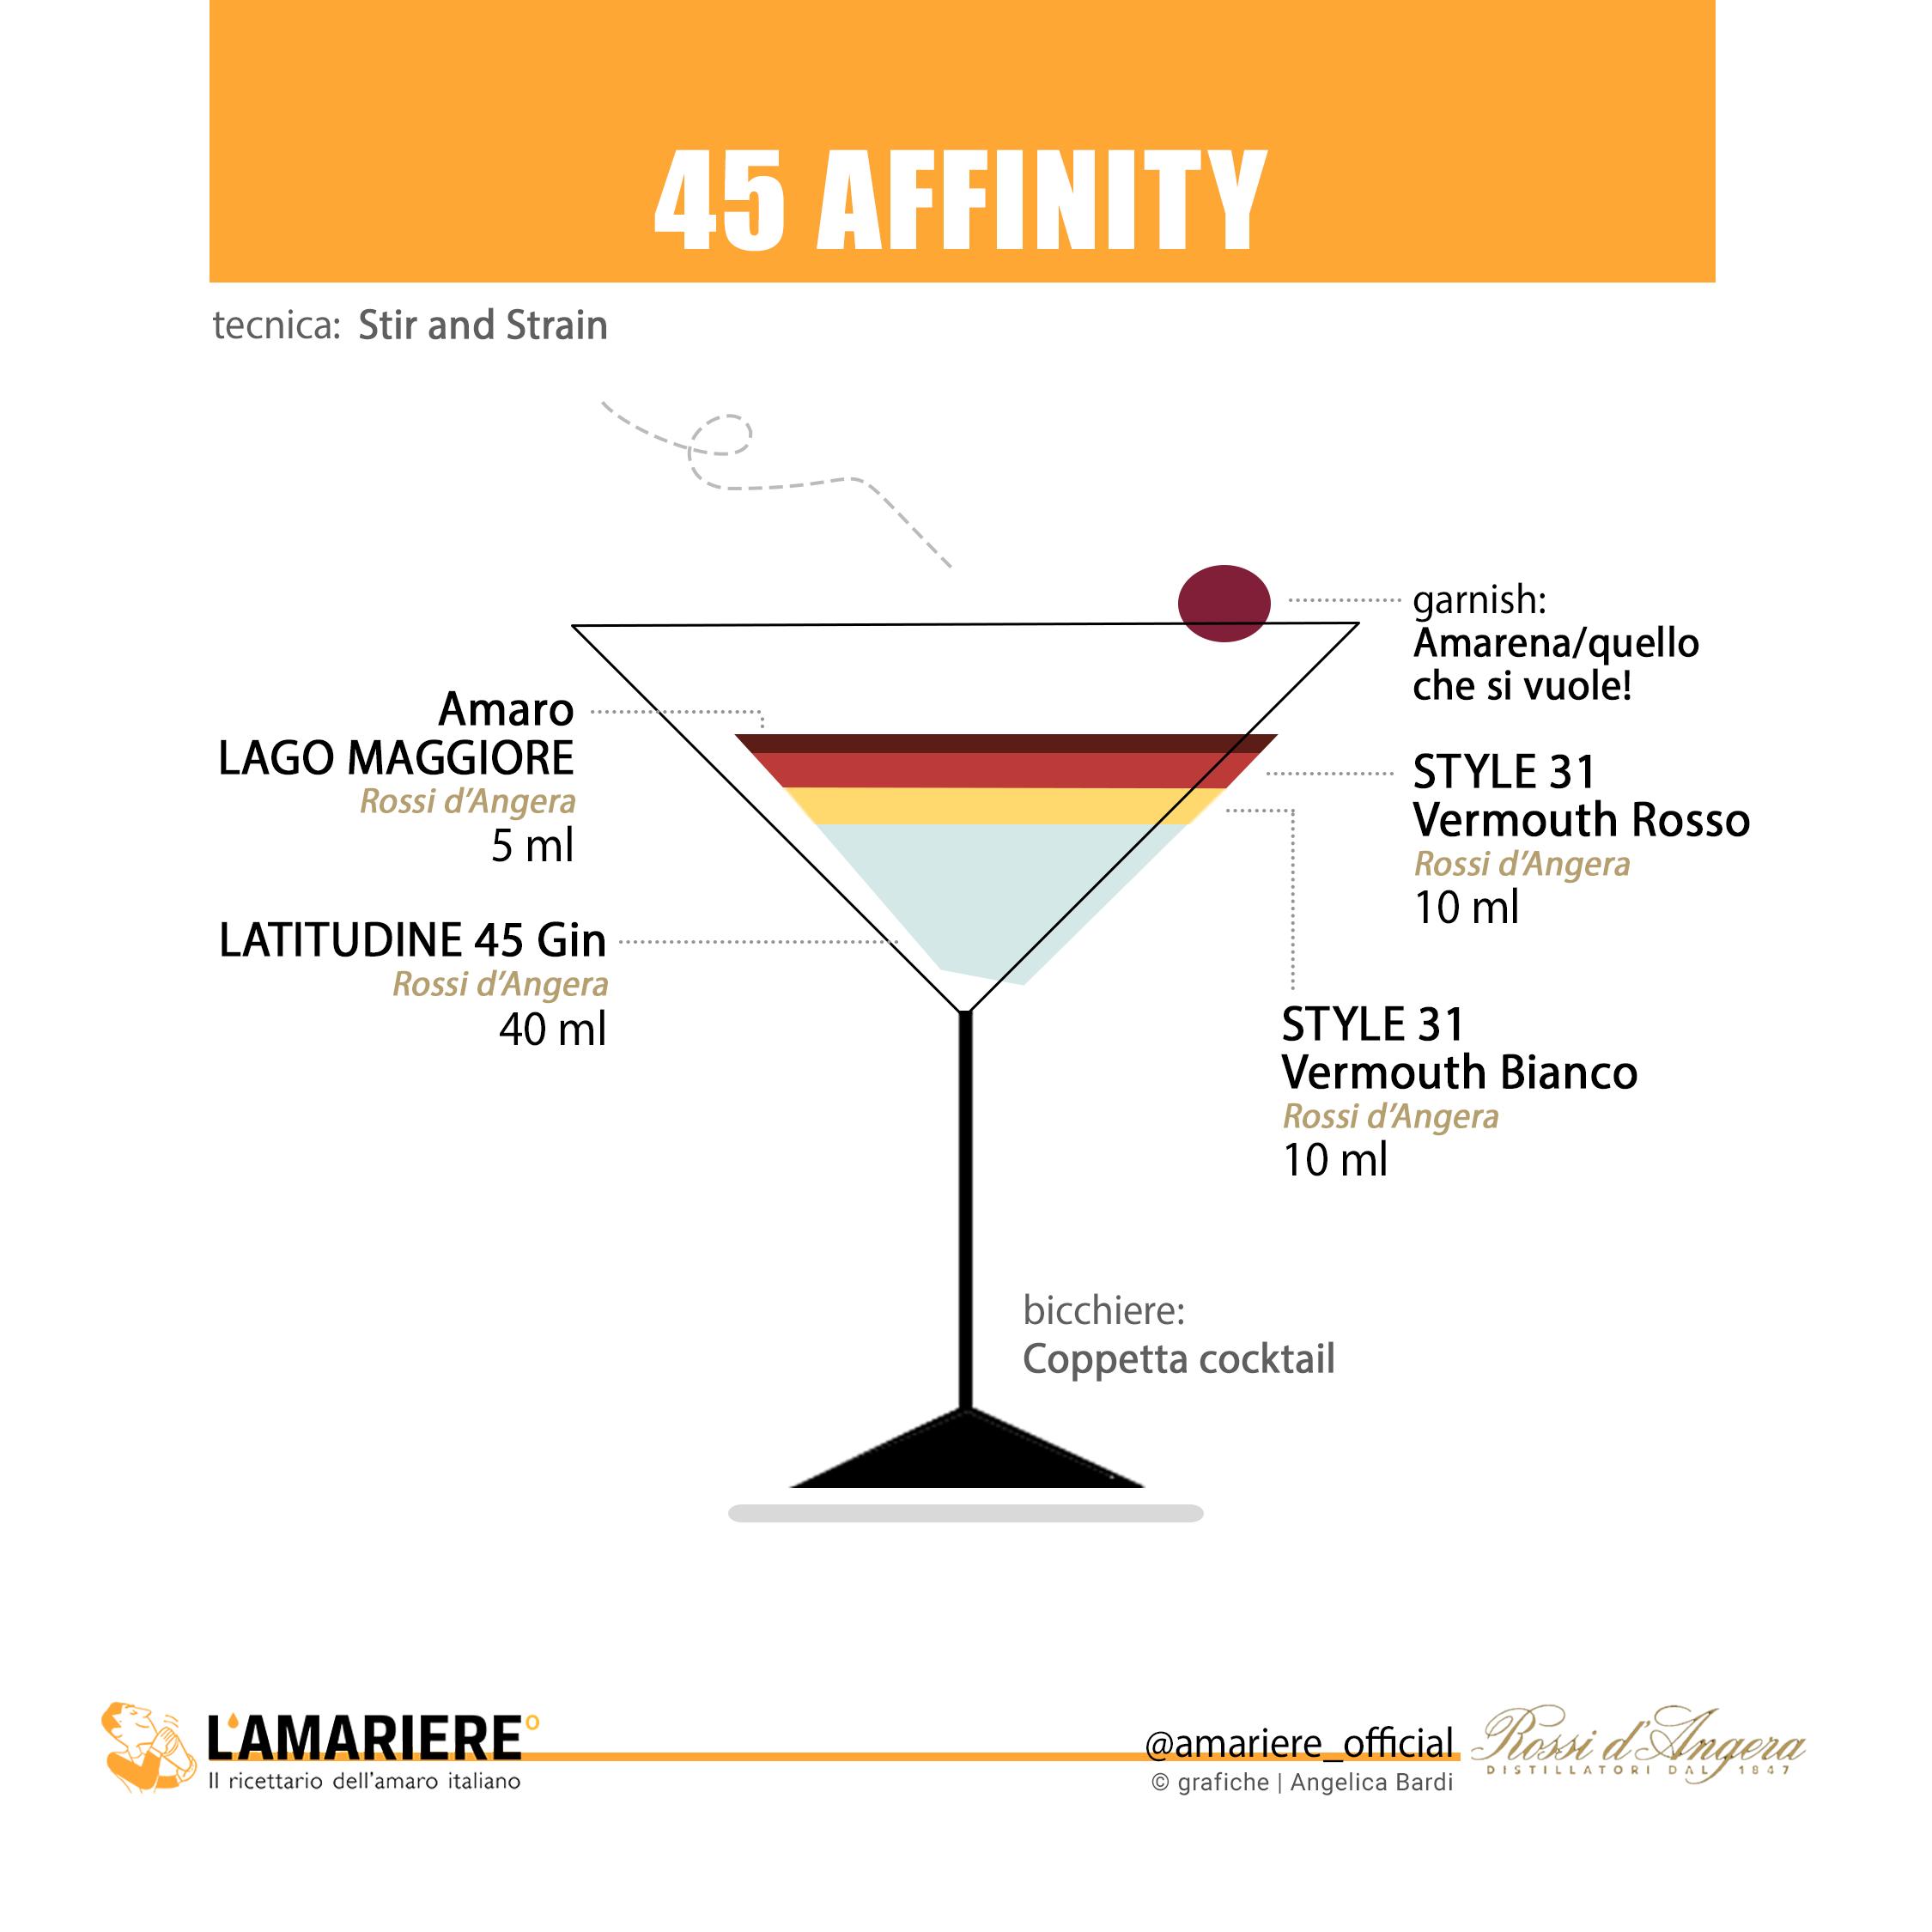 45 Affinity